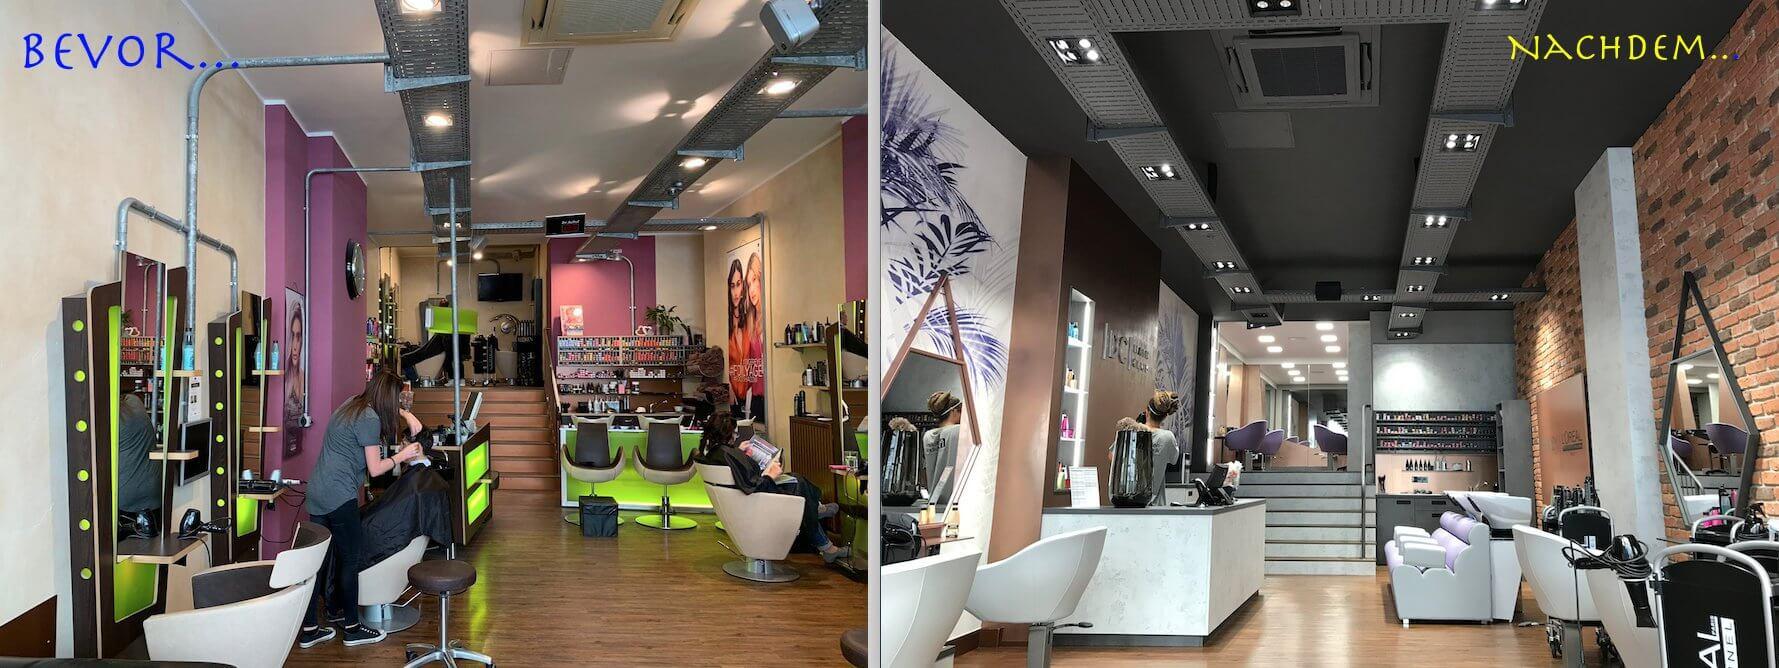 arredamento parrucchieri rinnovo salone